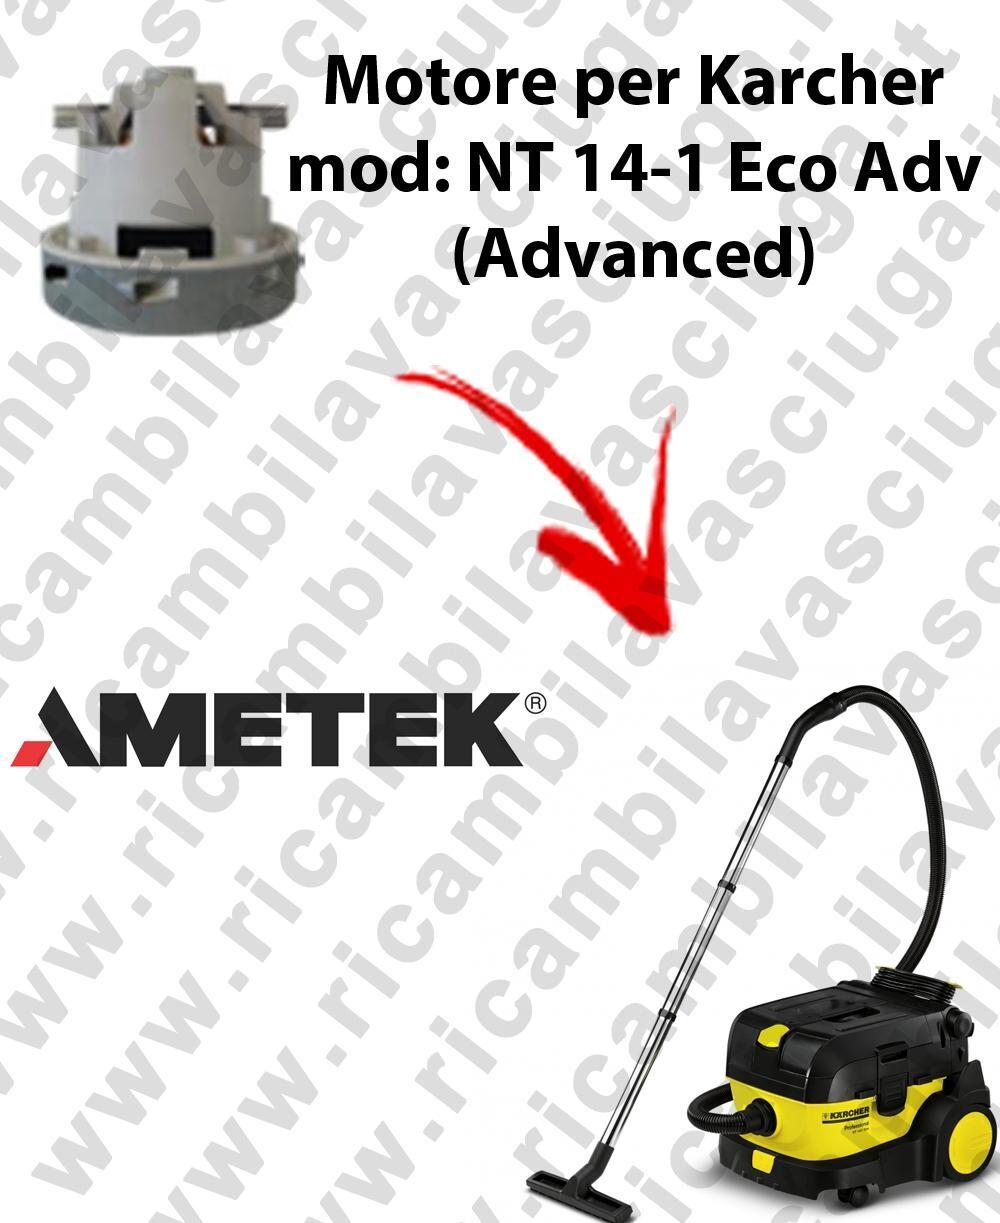 Karcher NT 14-1 Eco ADV (Advanced) MOTORE aspirazione AMETEK per aspirapolvere